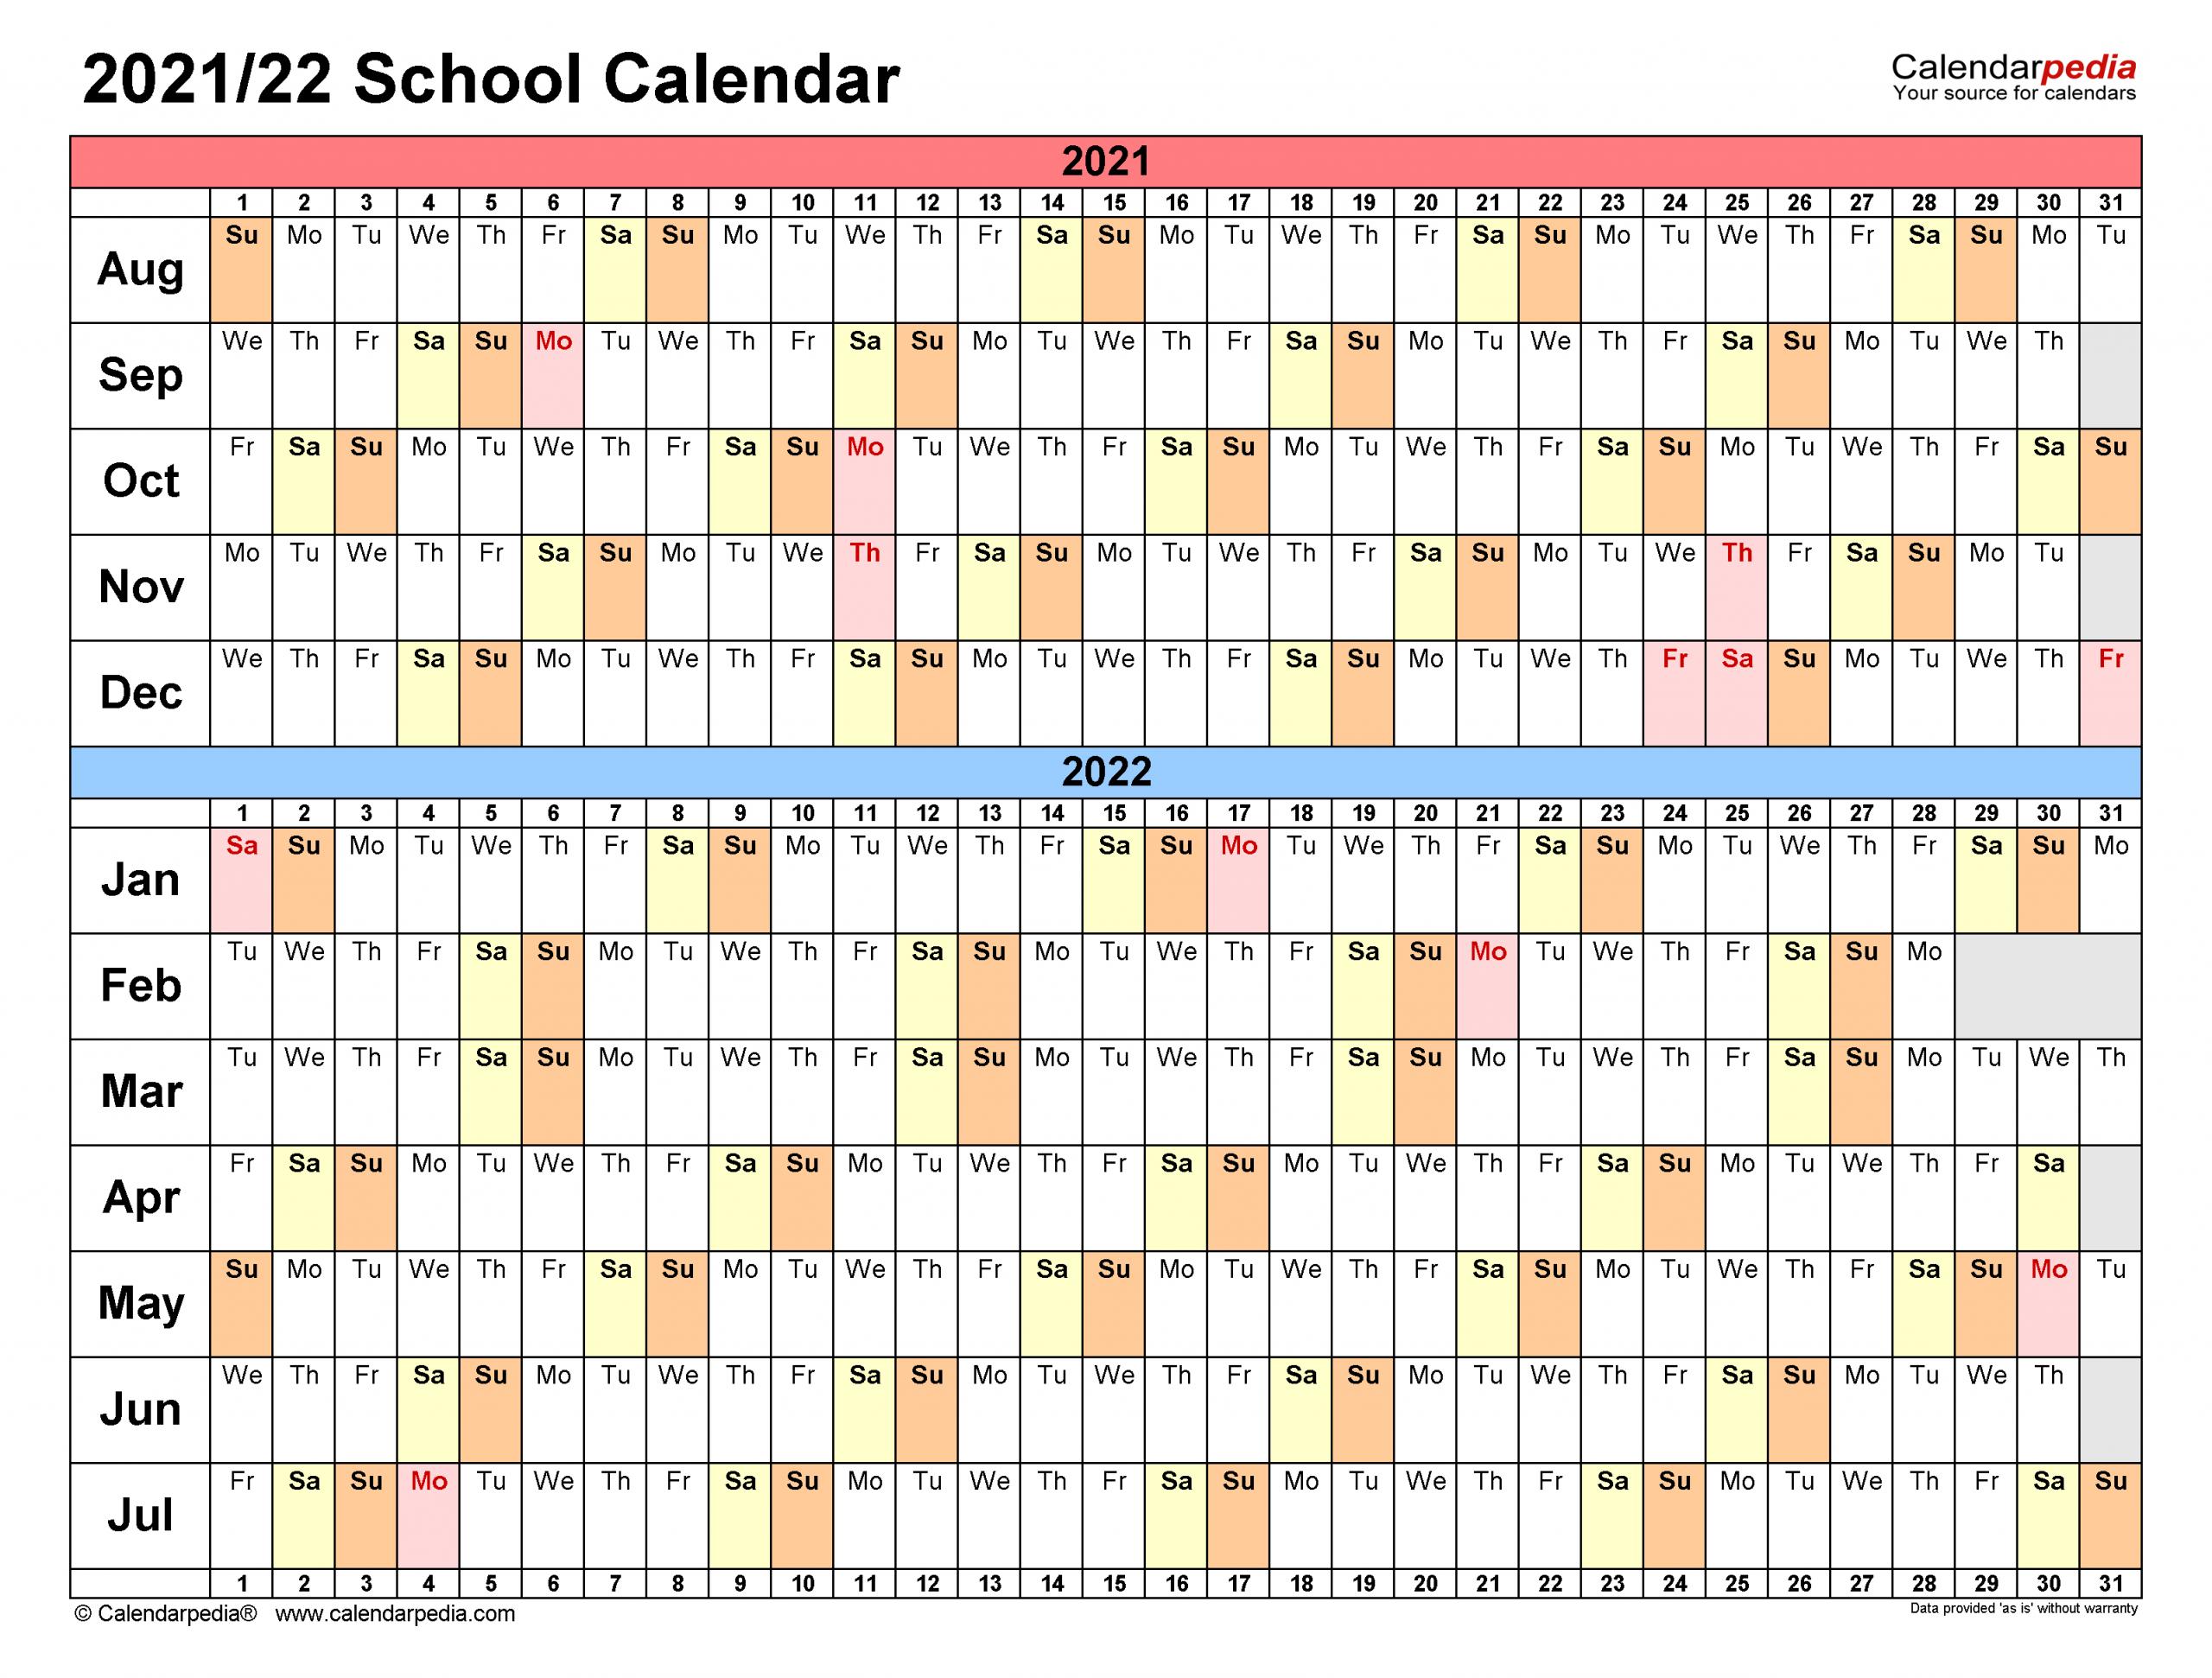 School Calendars 2021 2022 Free Printable Word Templates